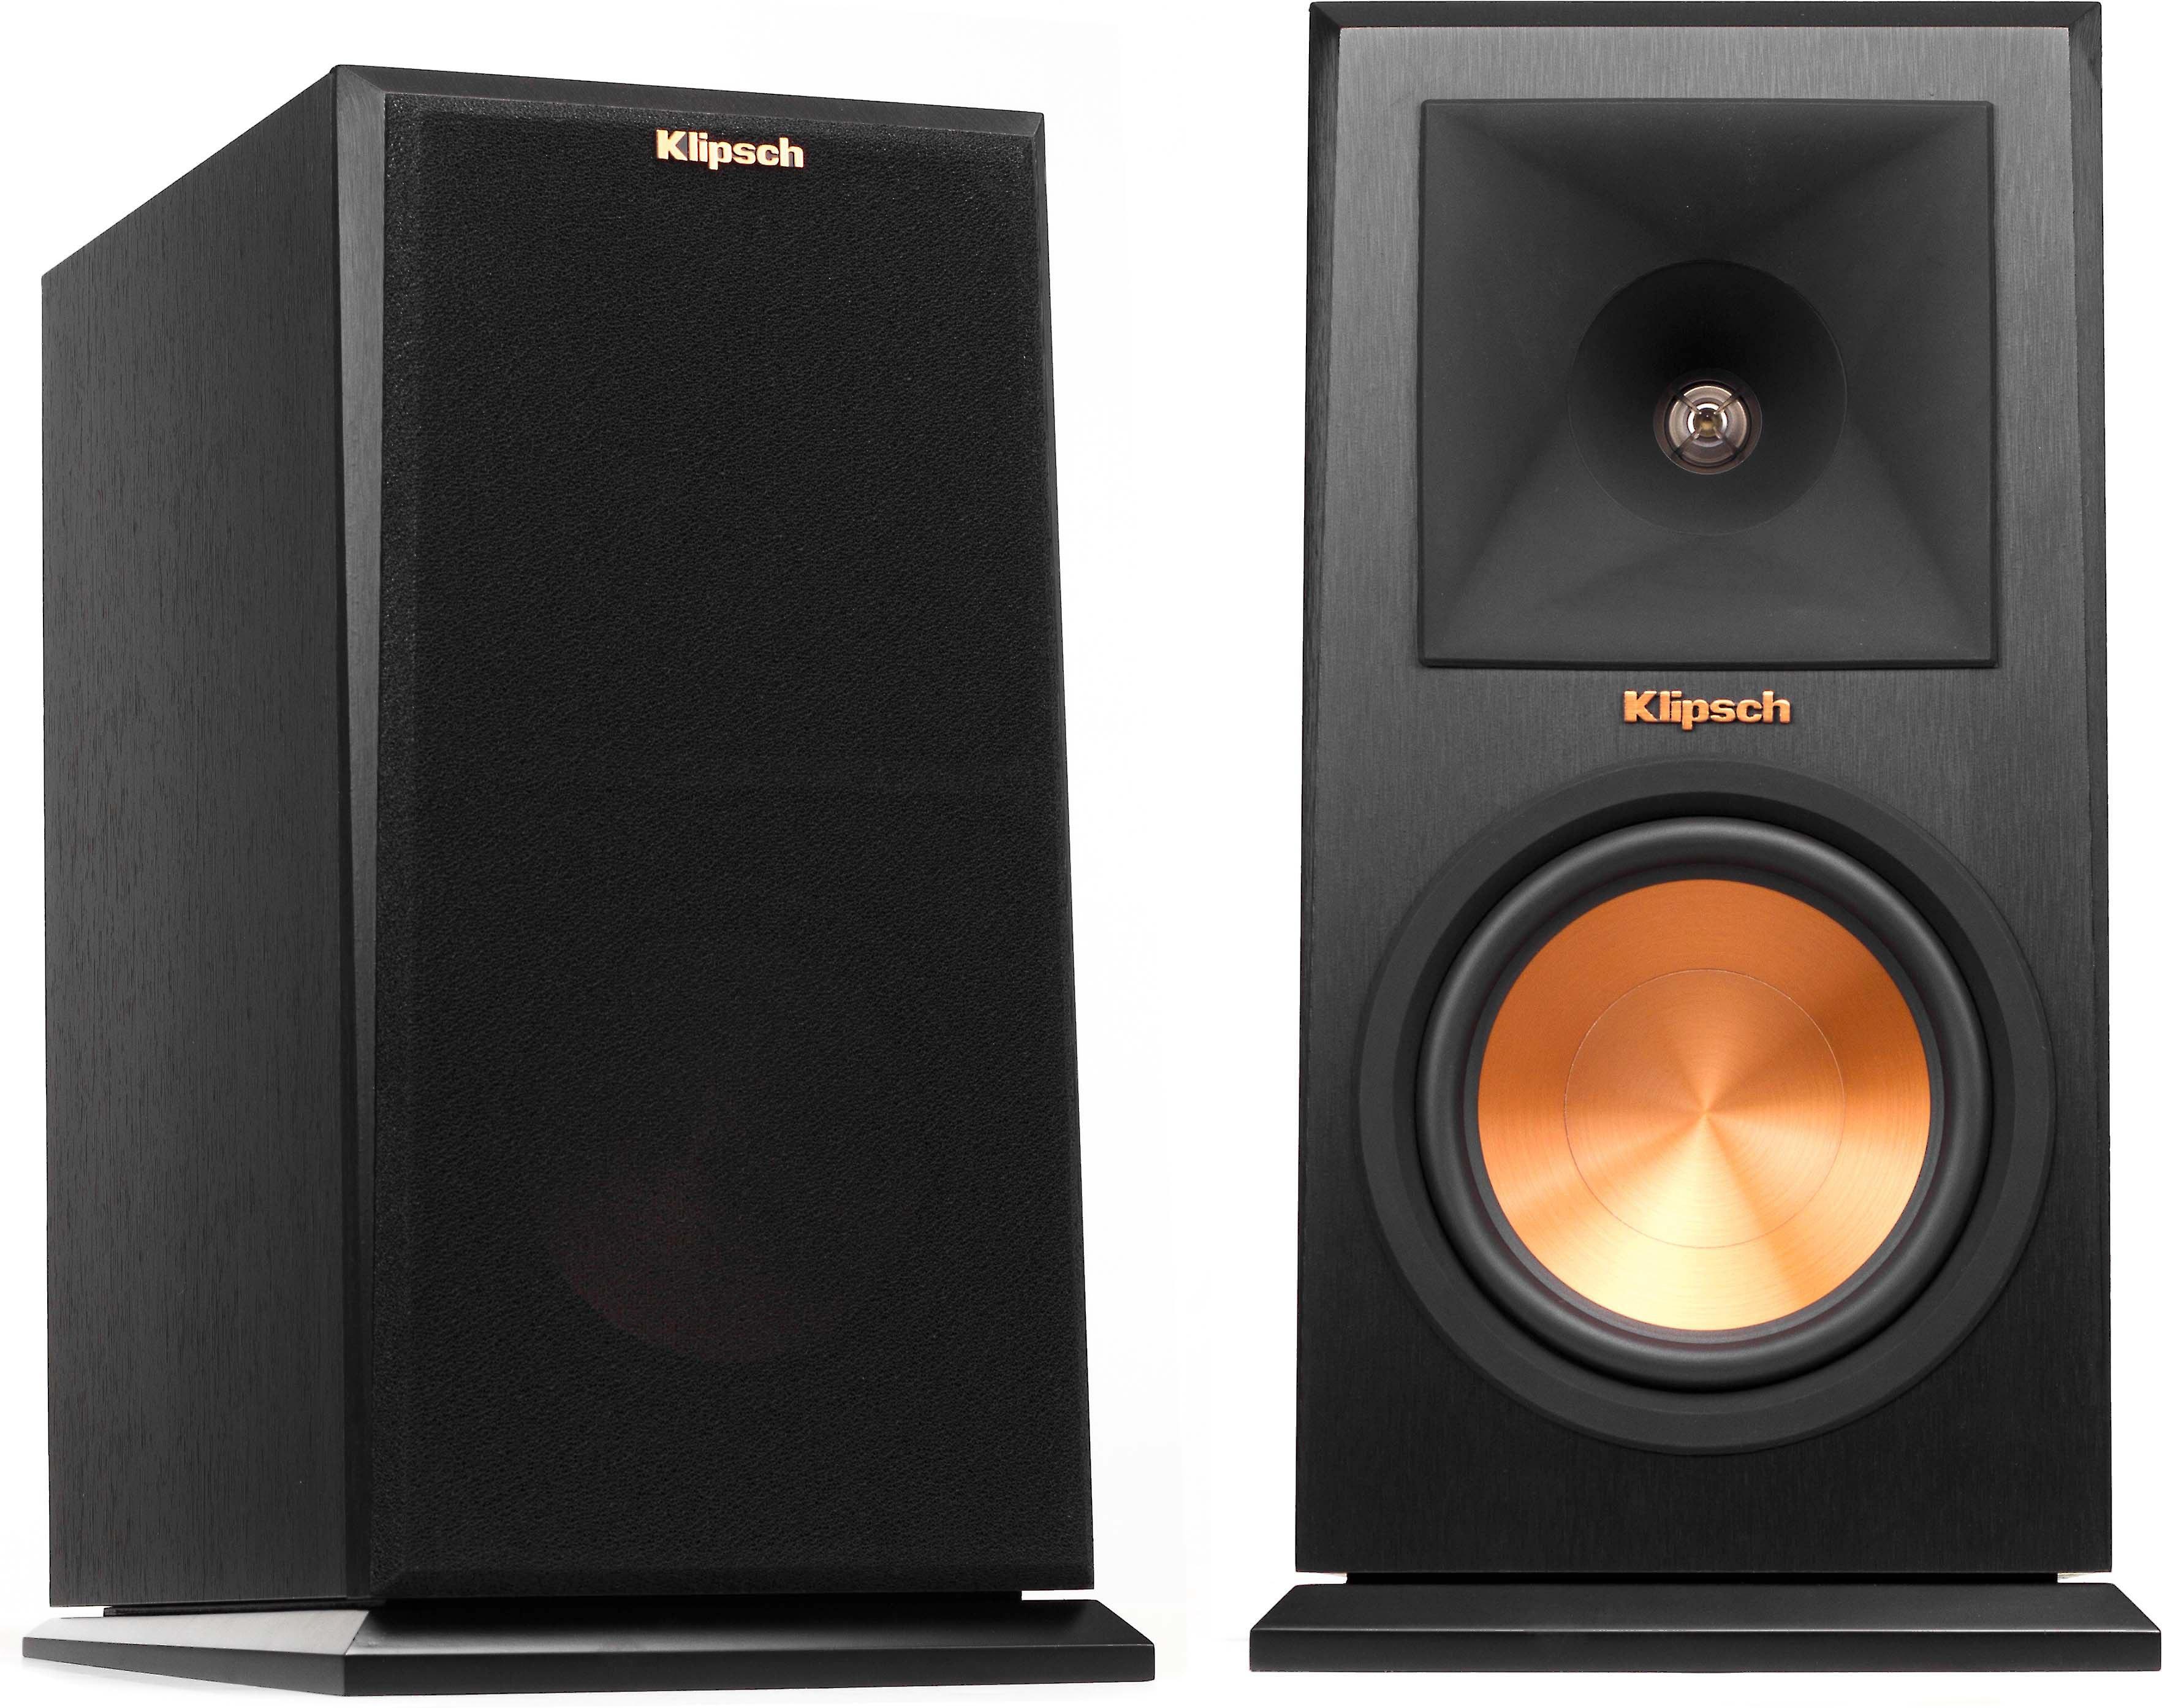 Klipsch Reference Premiere RP-160M (Ebony) Bookshelf speakers at Crutchfield